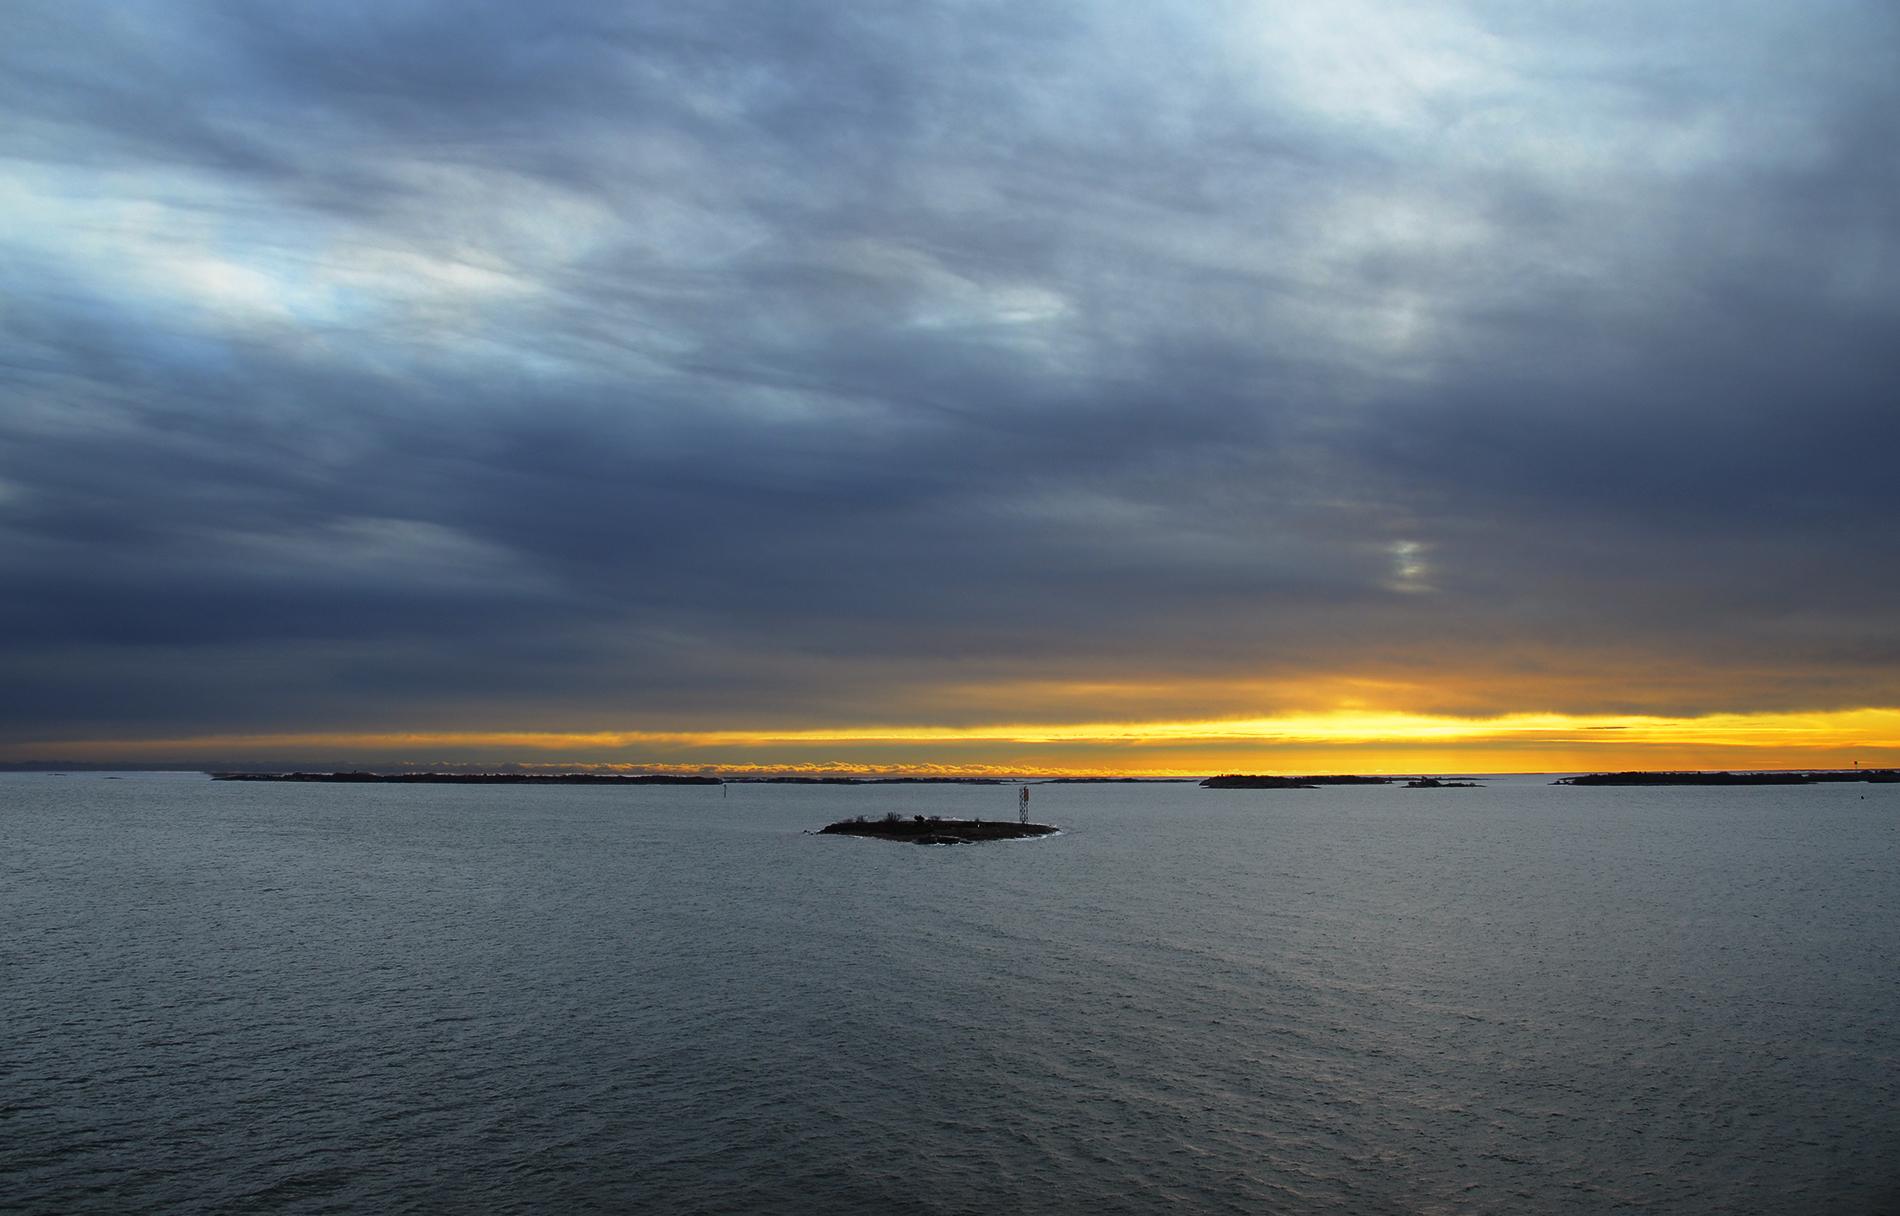 Baltic Sea at Sunset by HenrikSundholm